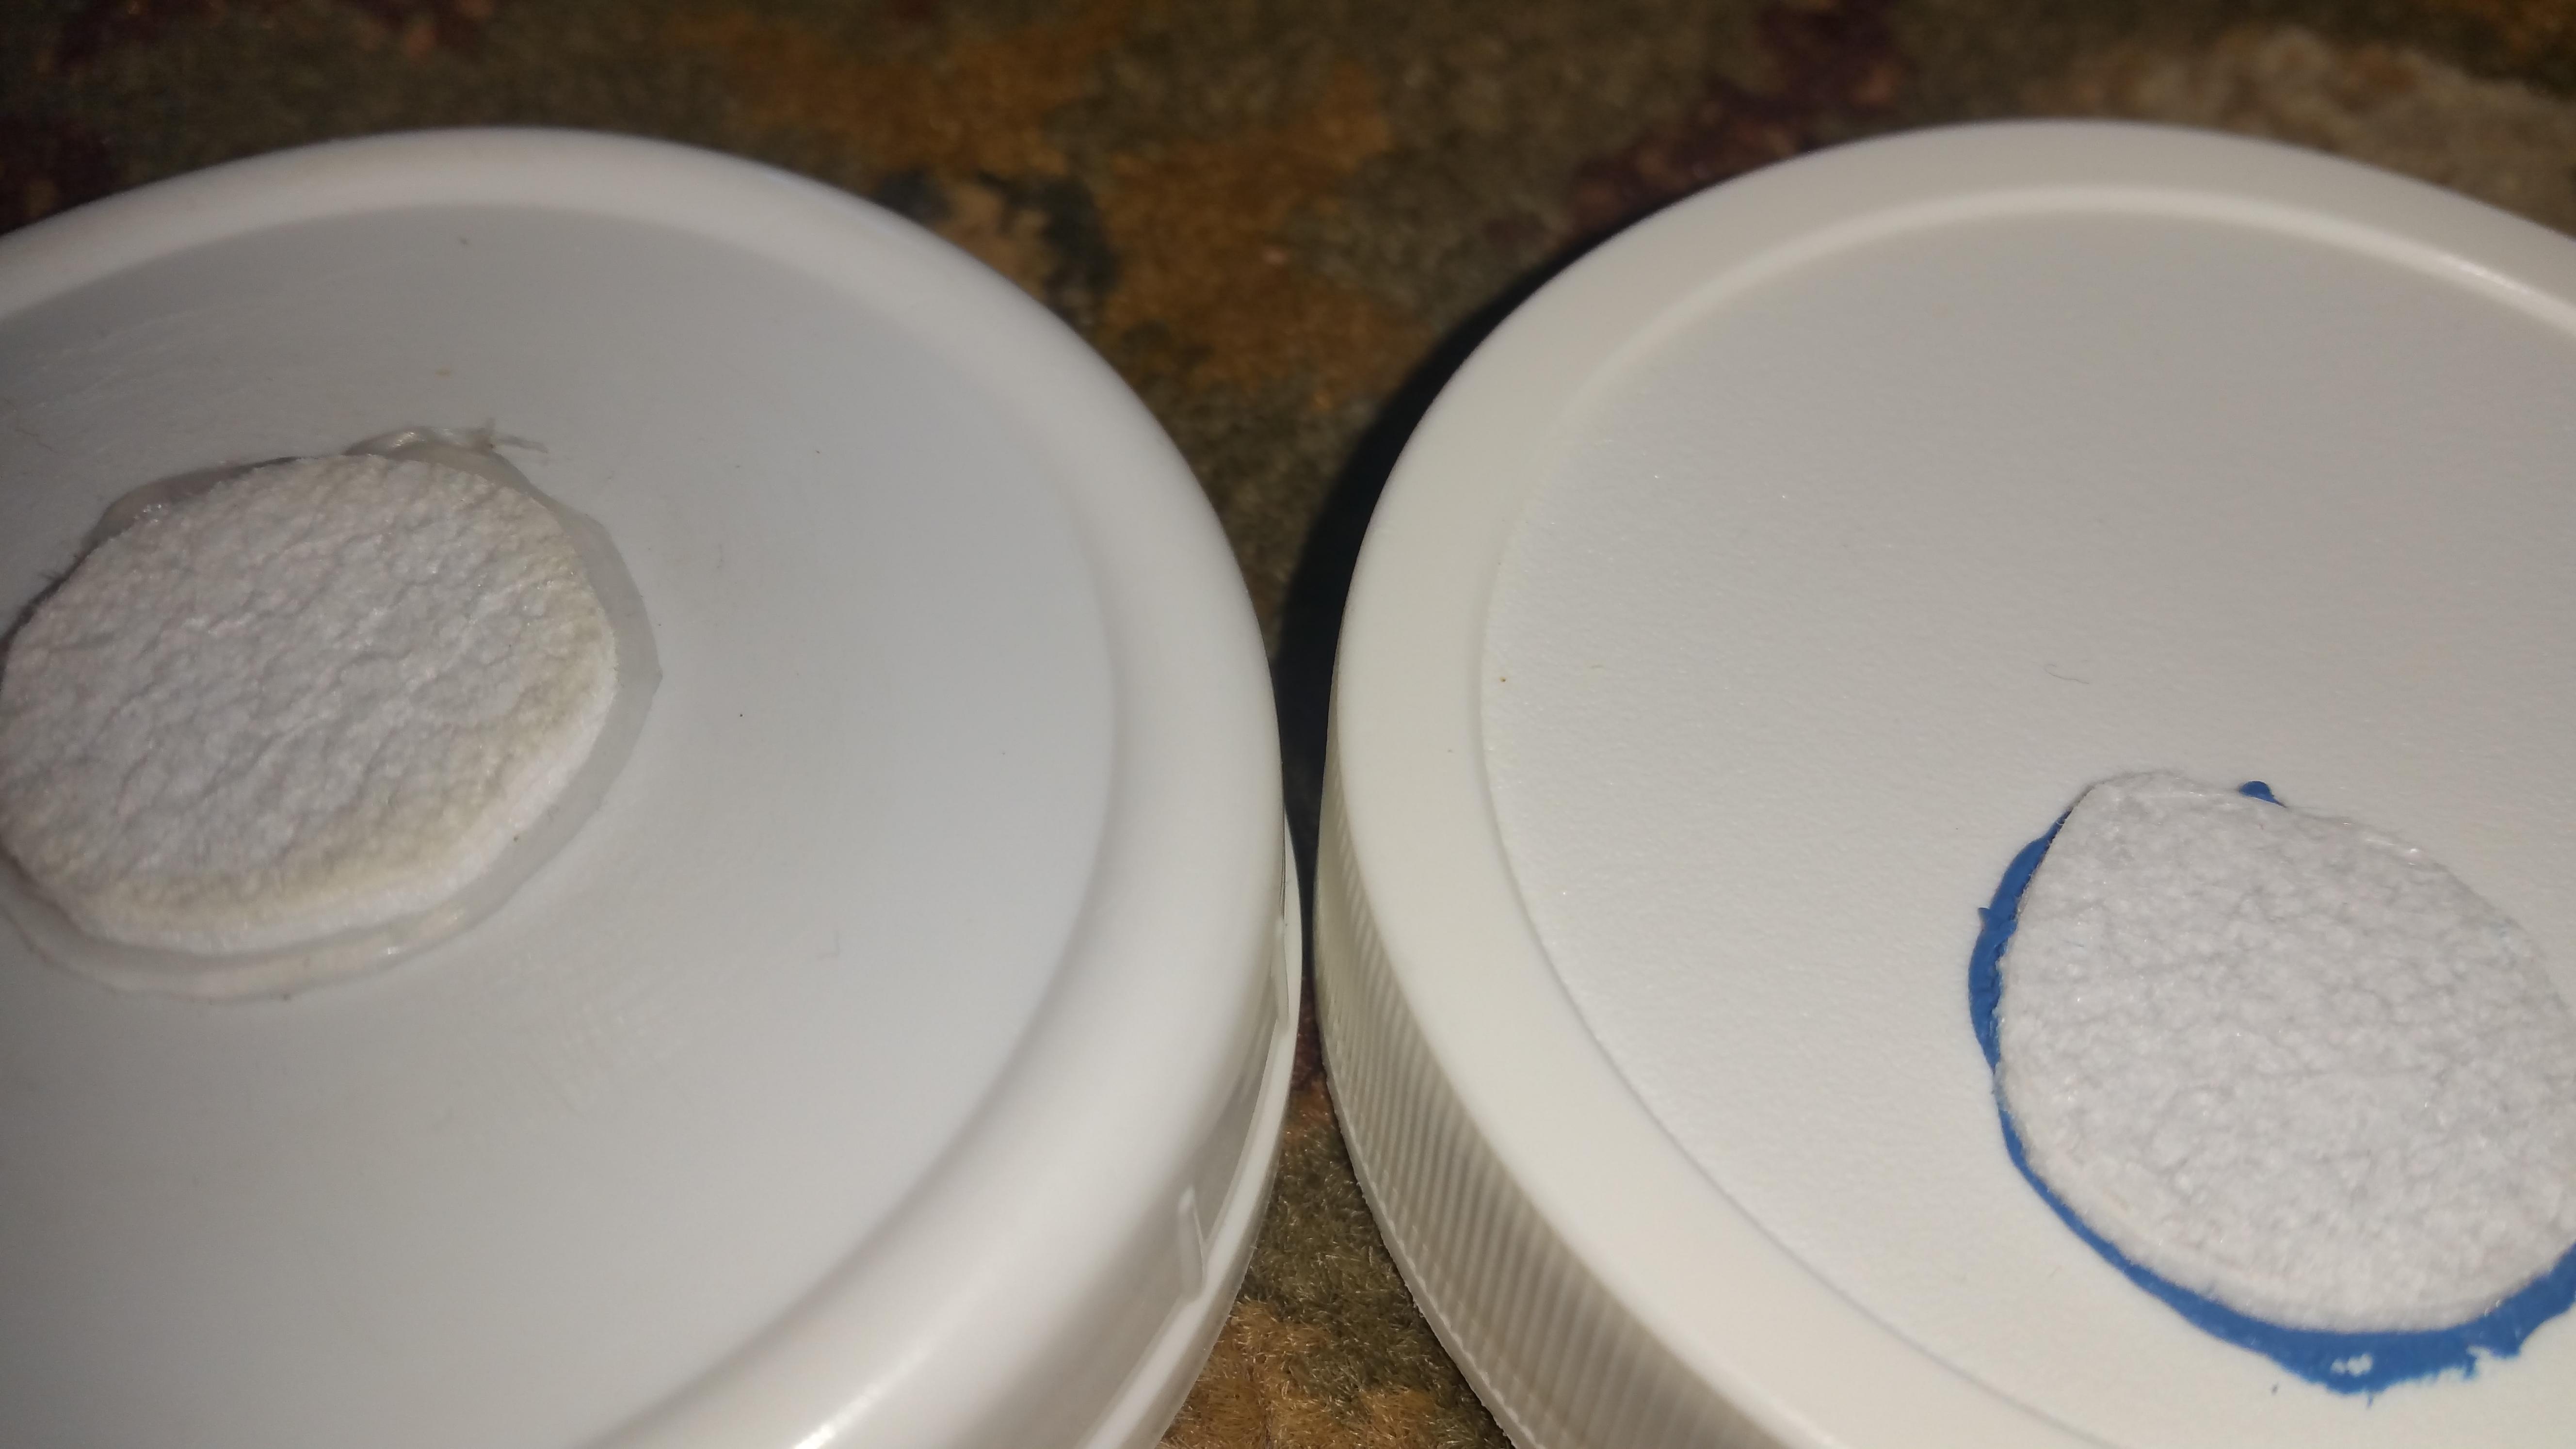 Silicone Vs Metal Cake Tins